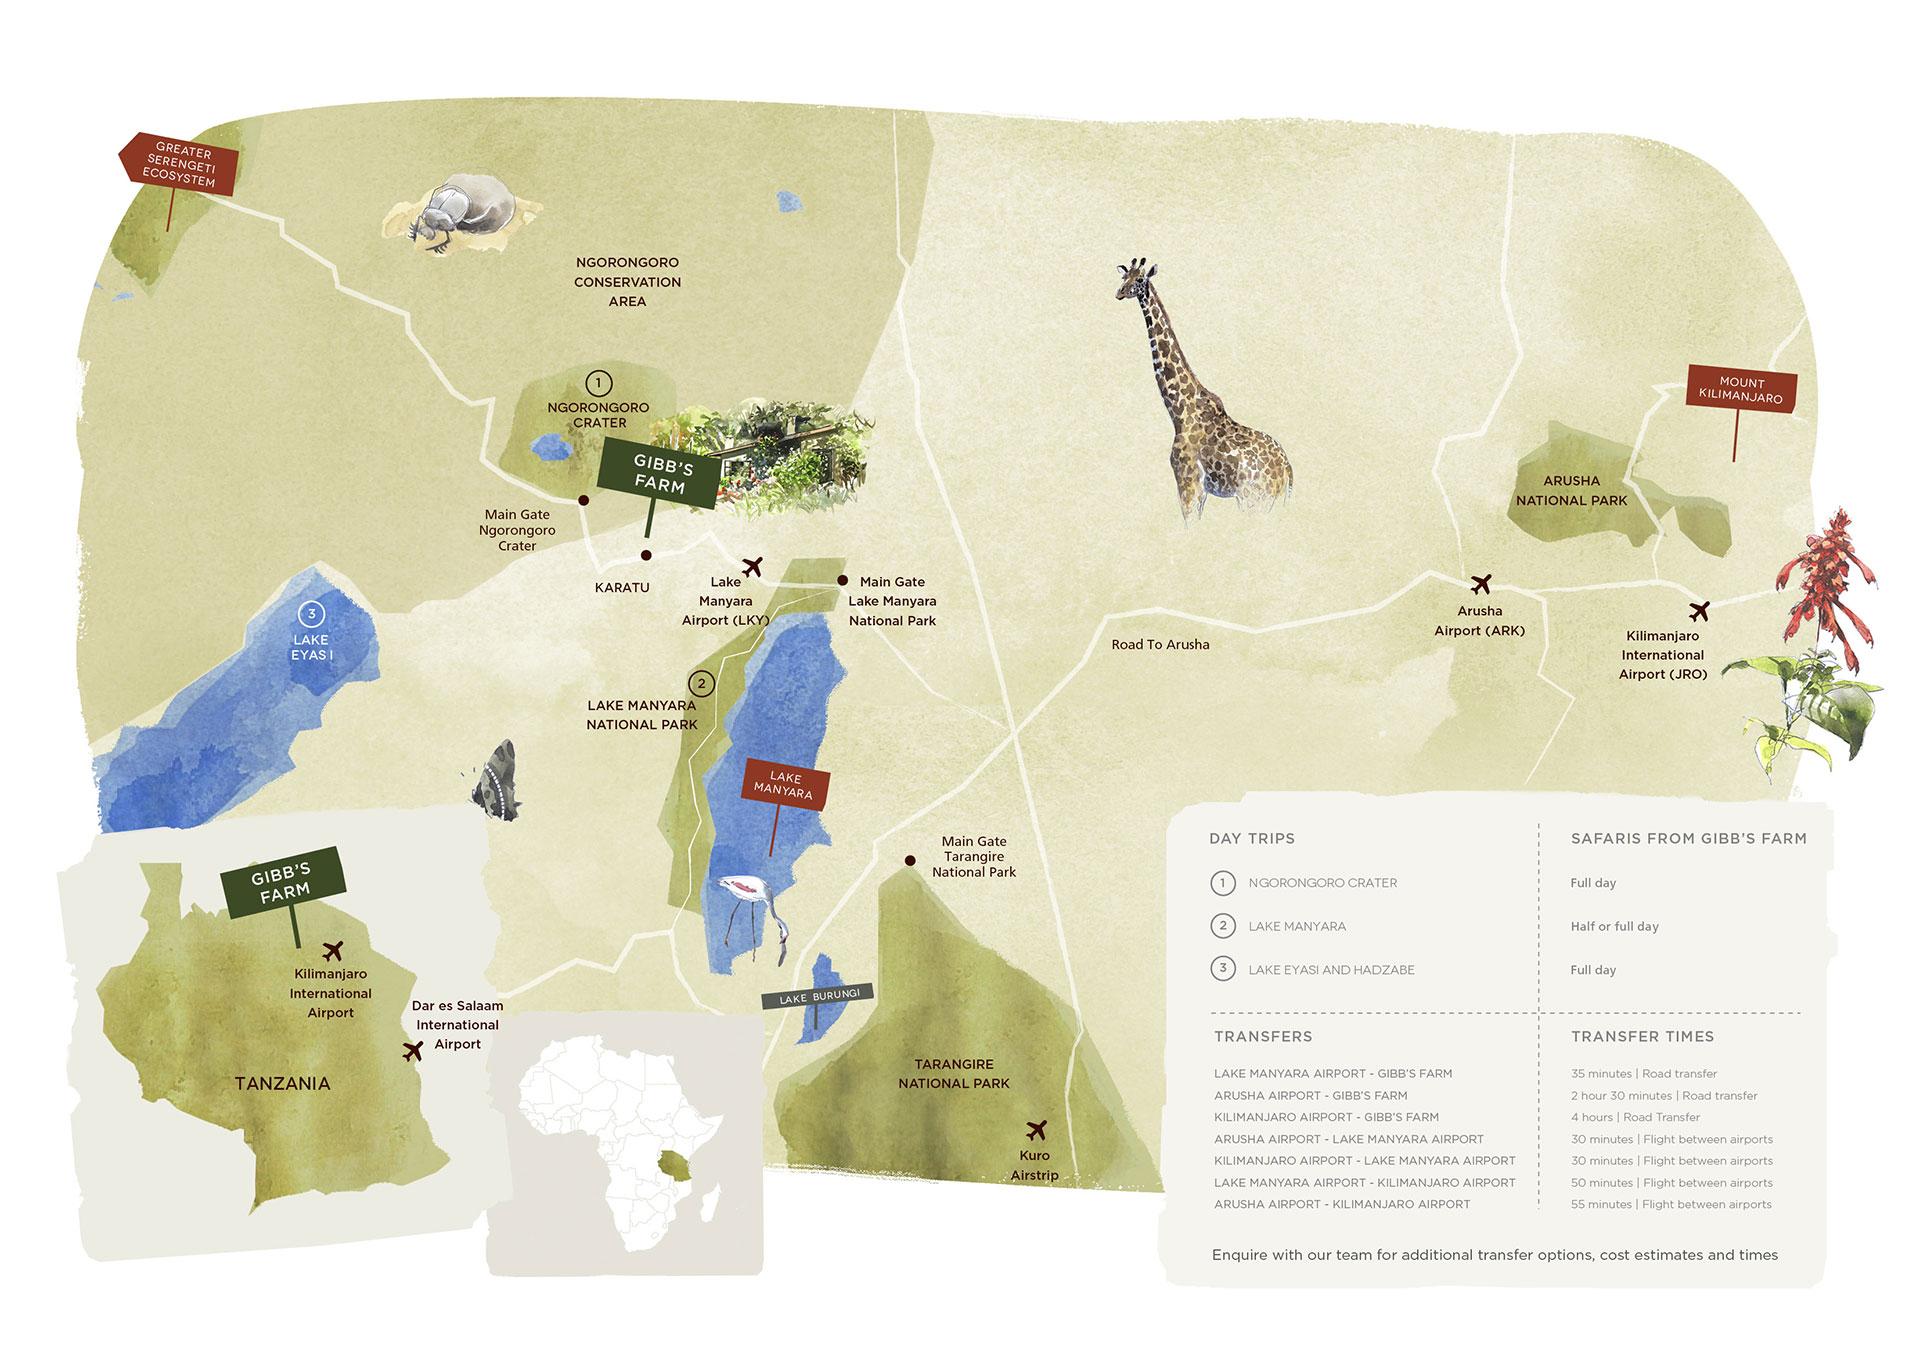 A map of gibbs farm